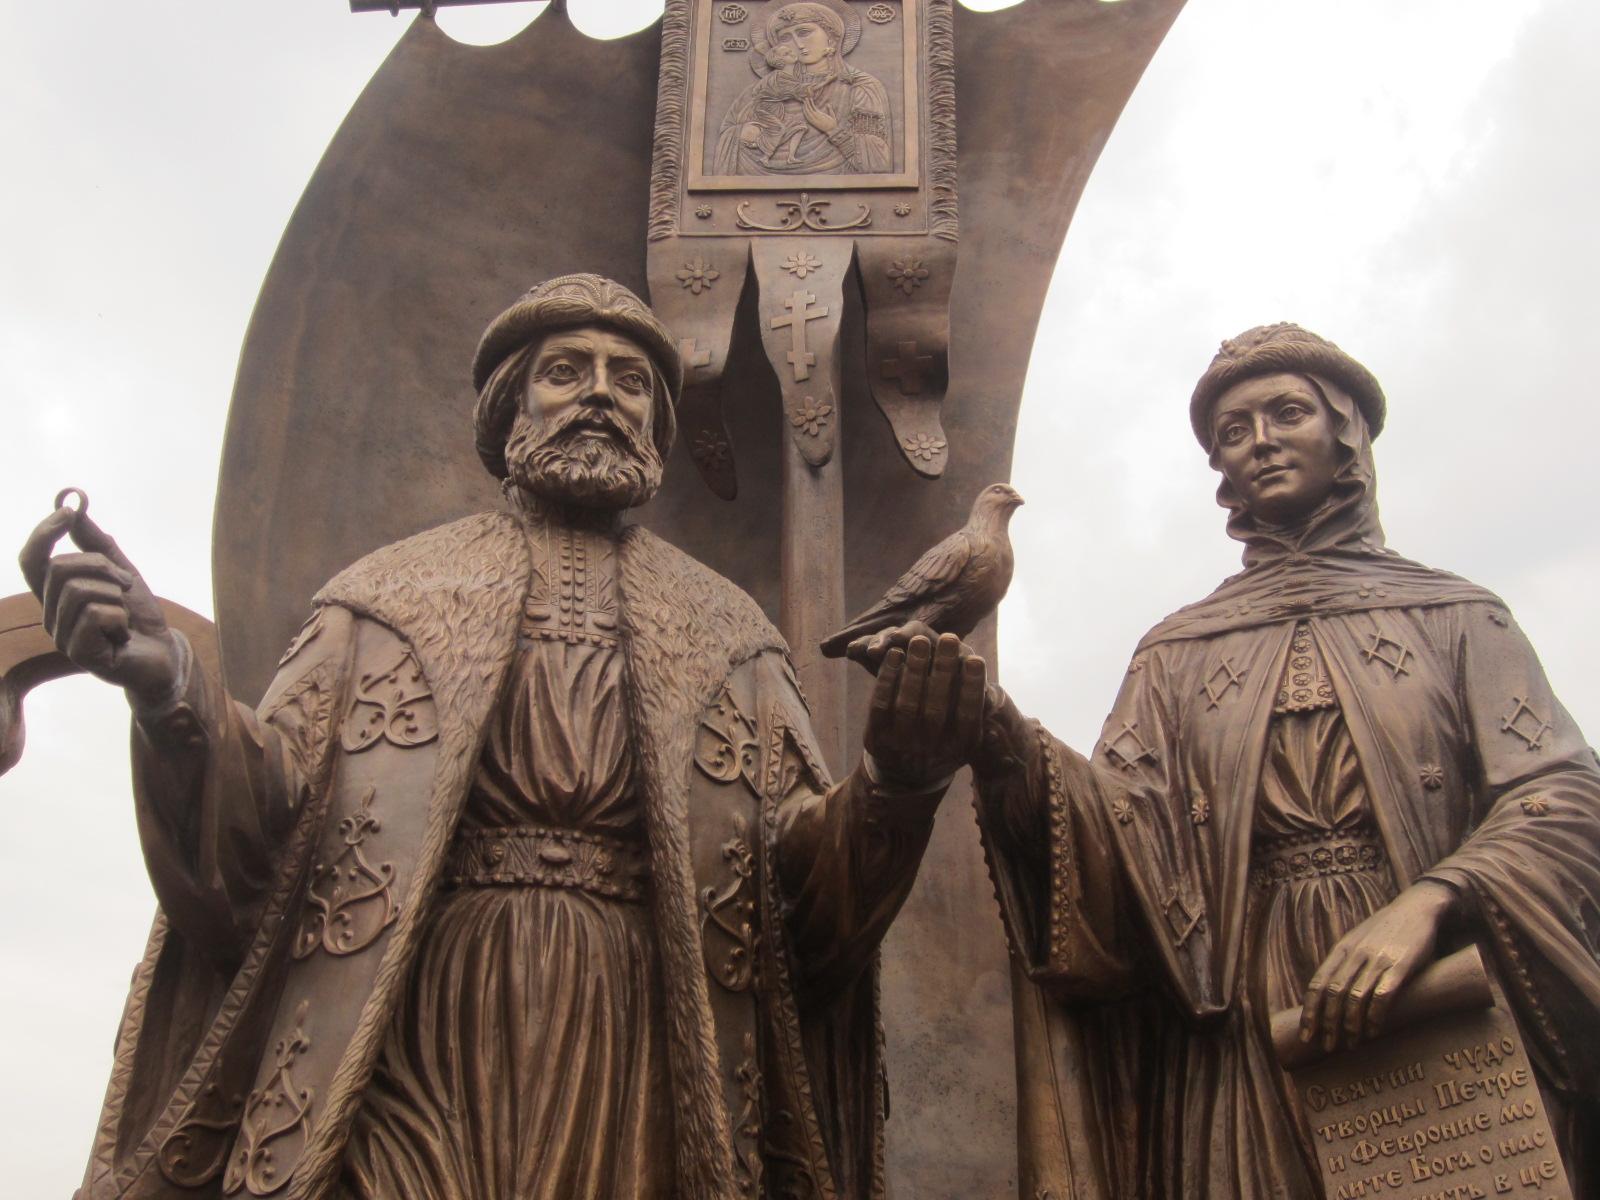 Петру и Февронии муромским в Екатеринбурге